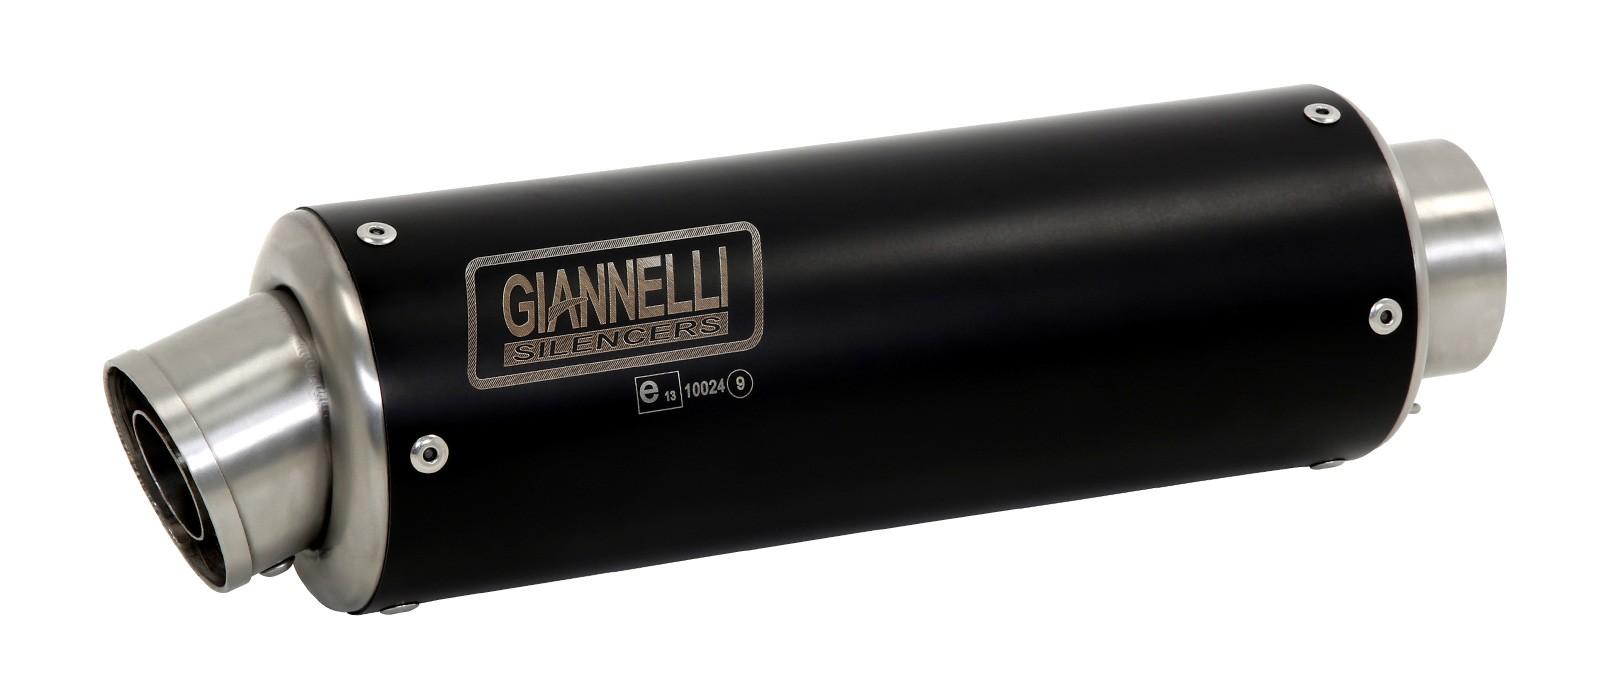 ESCAPES GIANNELLI HONDA - Sistema completo nicrom X-PRO Honda SW-T 600 Giannelli 73575XPI -